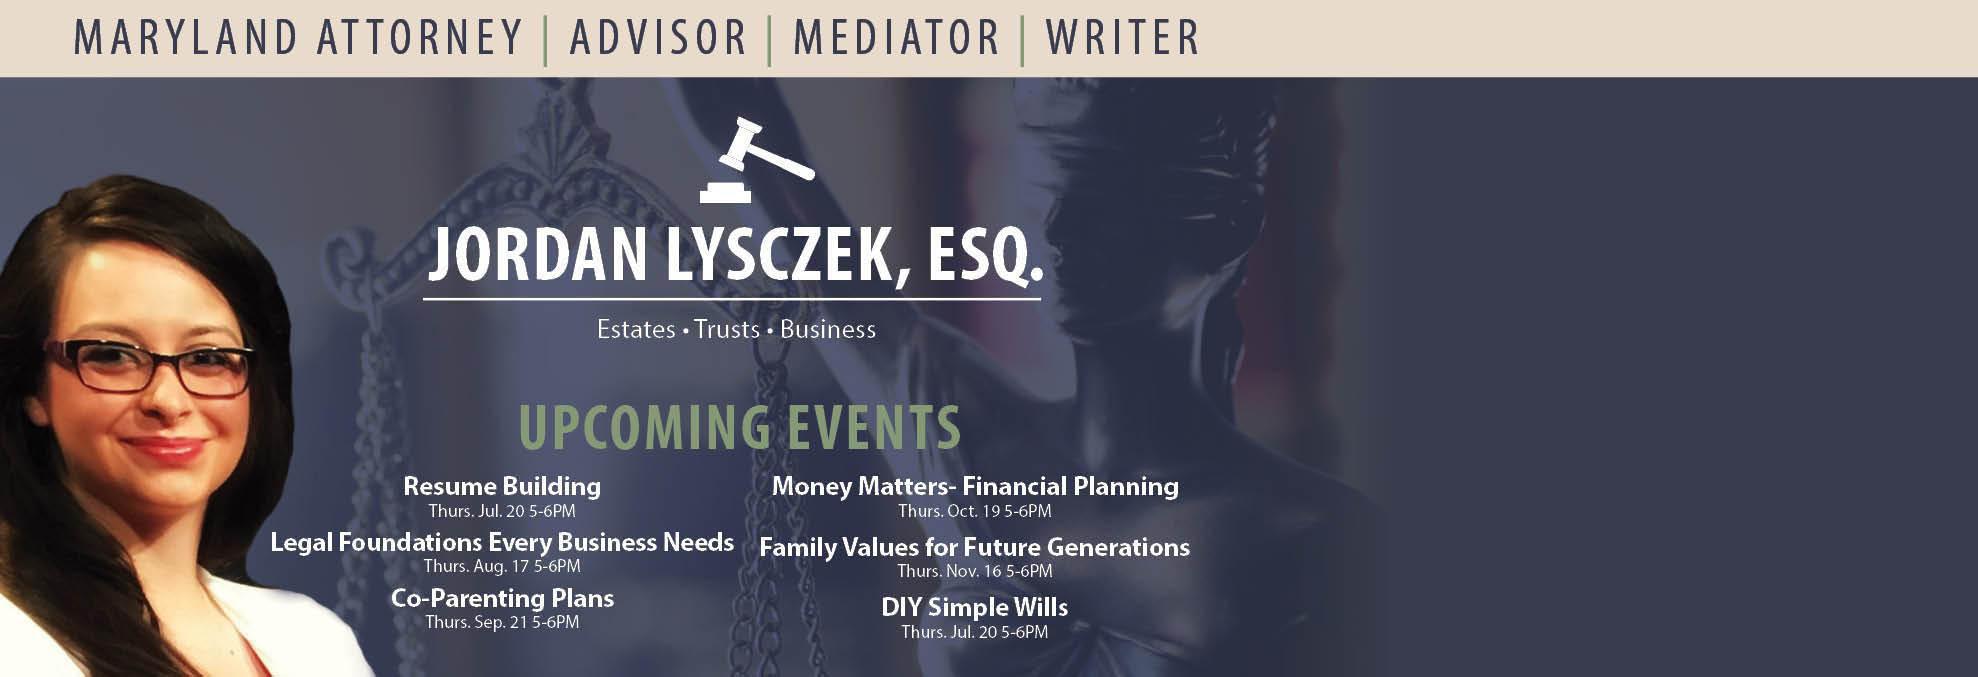 jordan lysczek, esq., family, planning, estates, business, consultation, lawyer, legal help, law